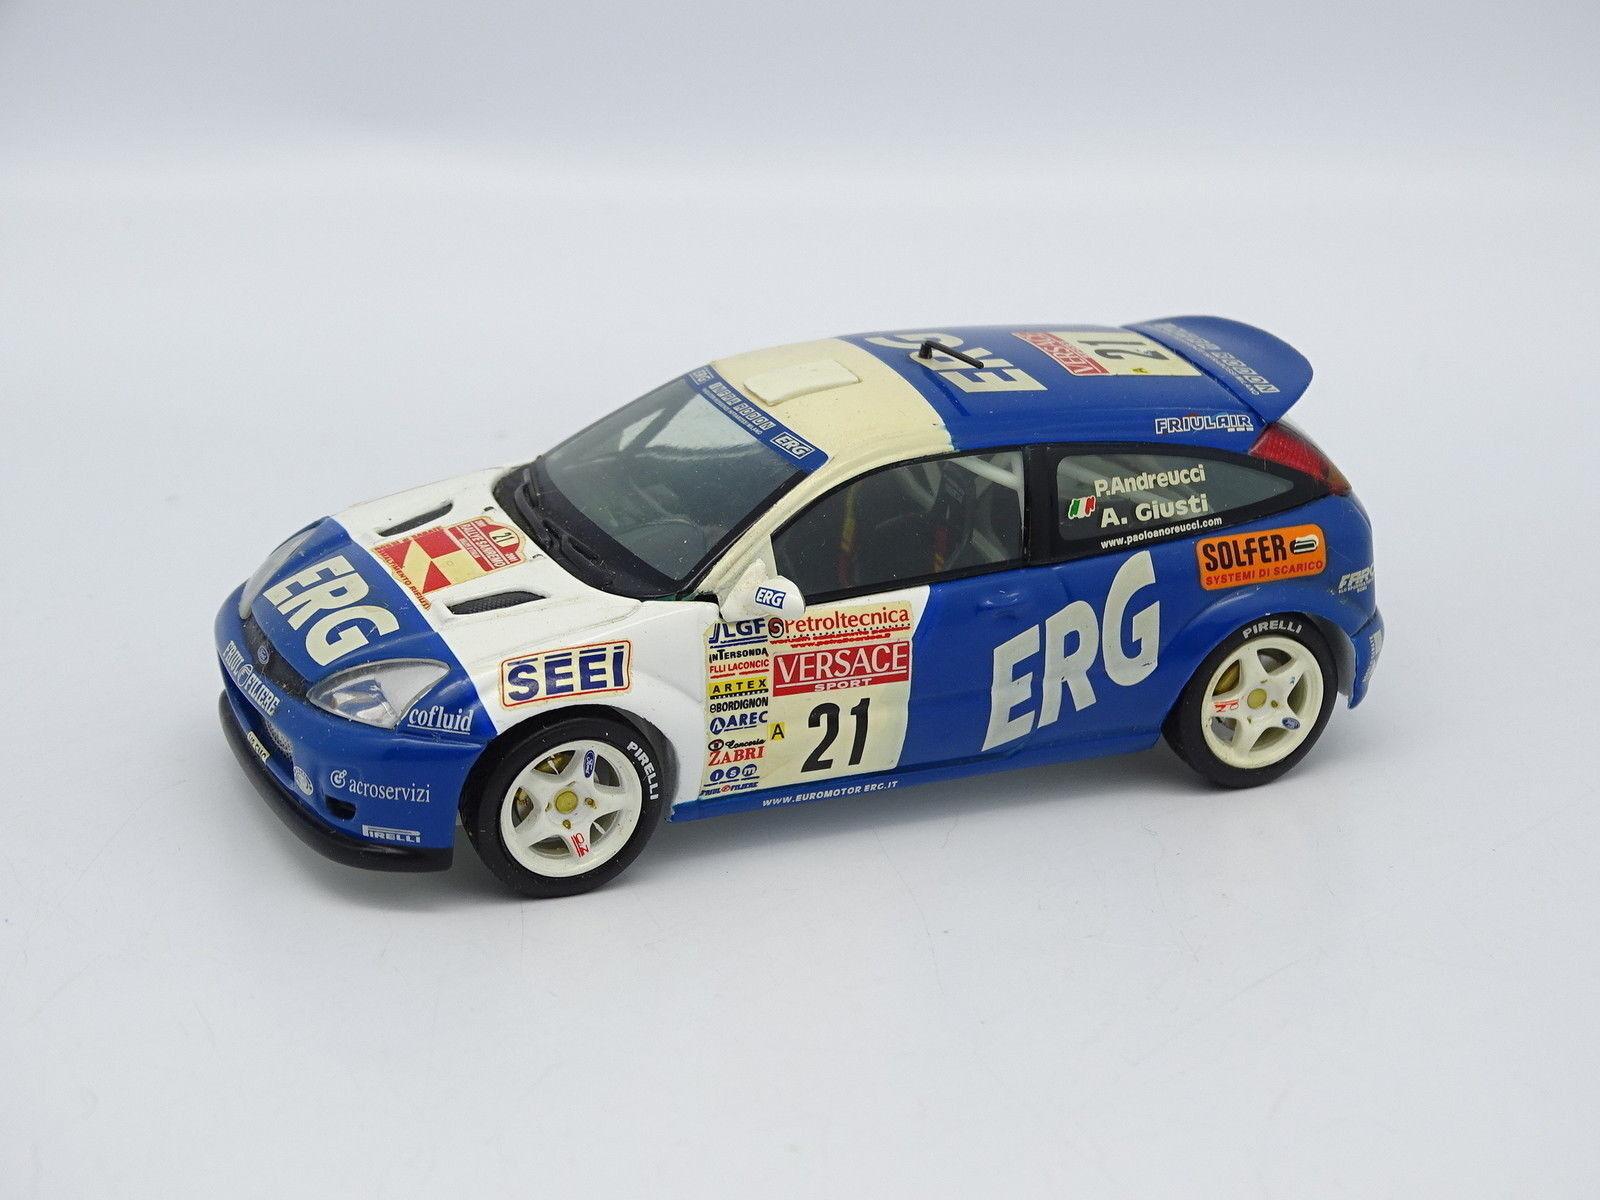 IXO SB 1 43 - FORD FOCUS WRC RALLY RALLY RALLY OF SANREMO 2001 NO.21 4ec8dc